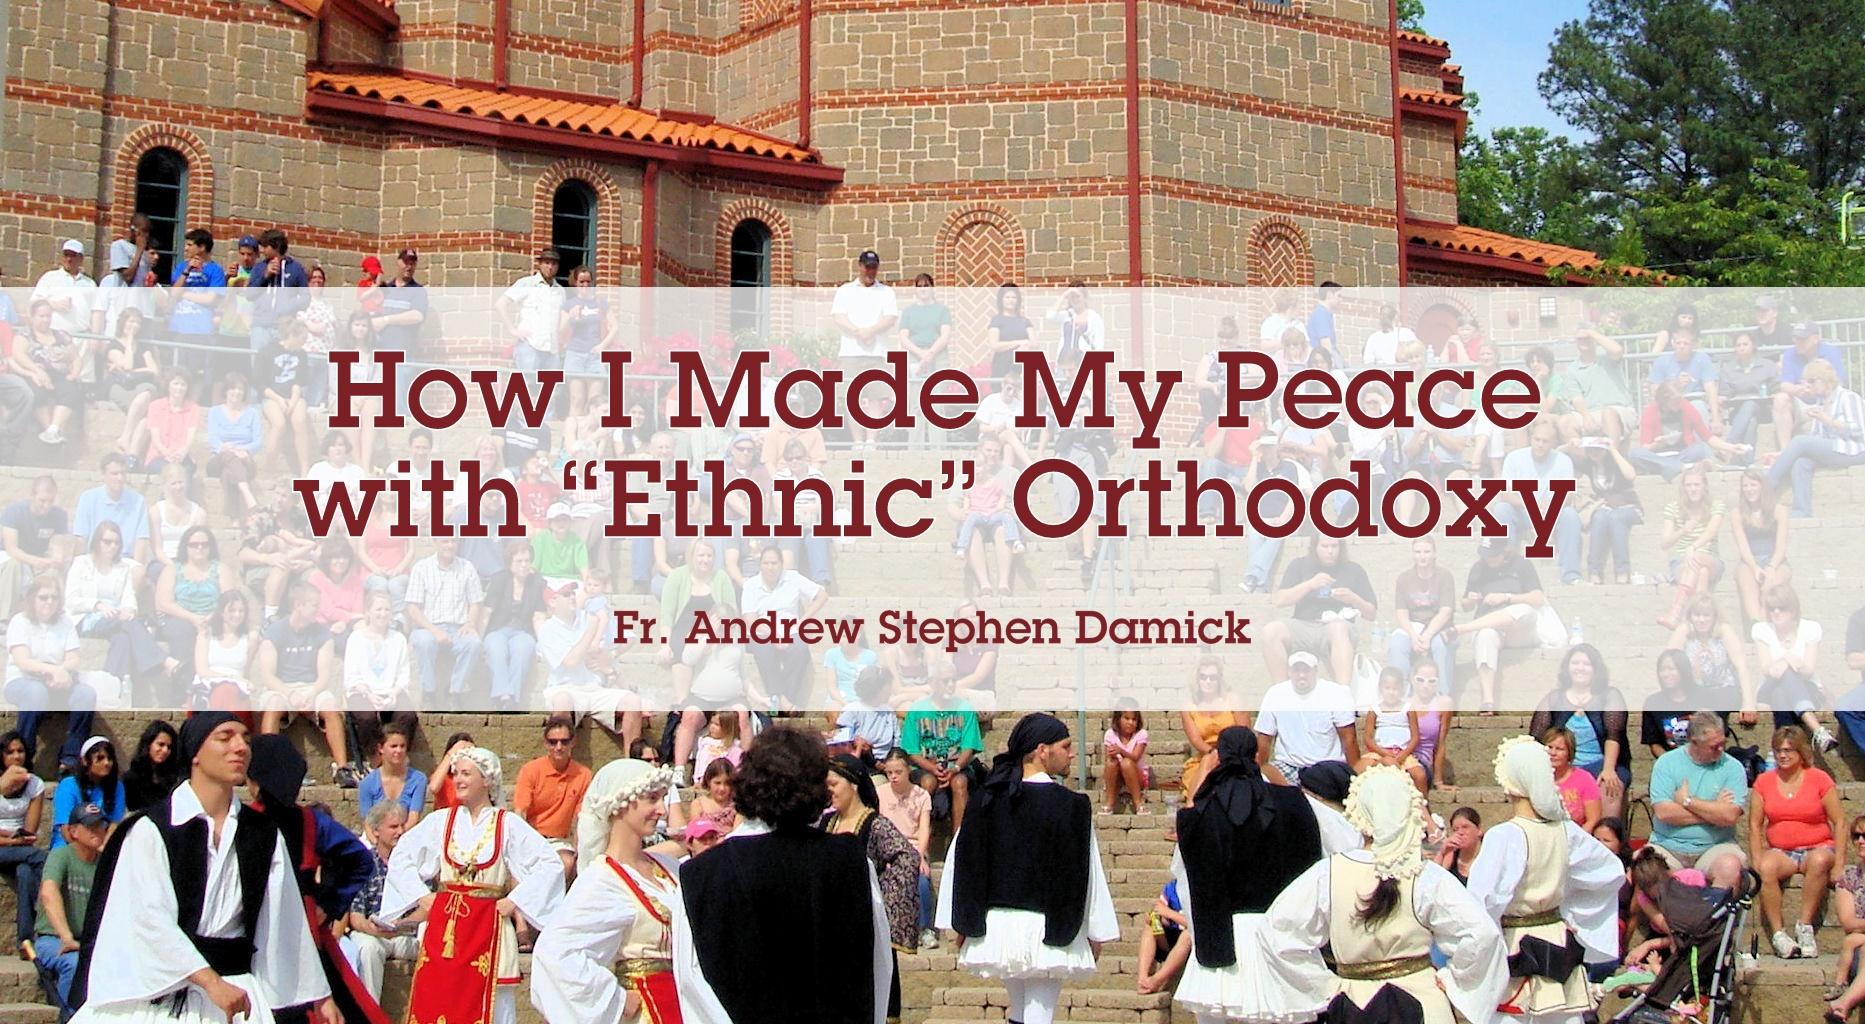 Should I Love Yourself - Orthodox Look